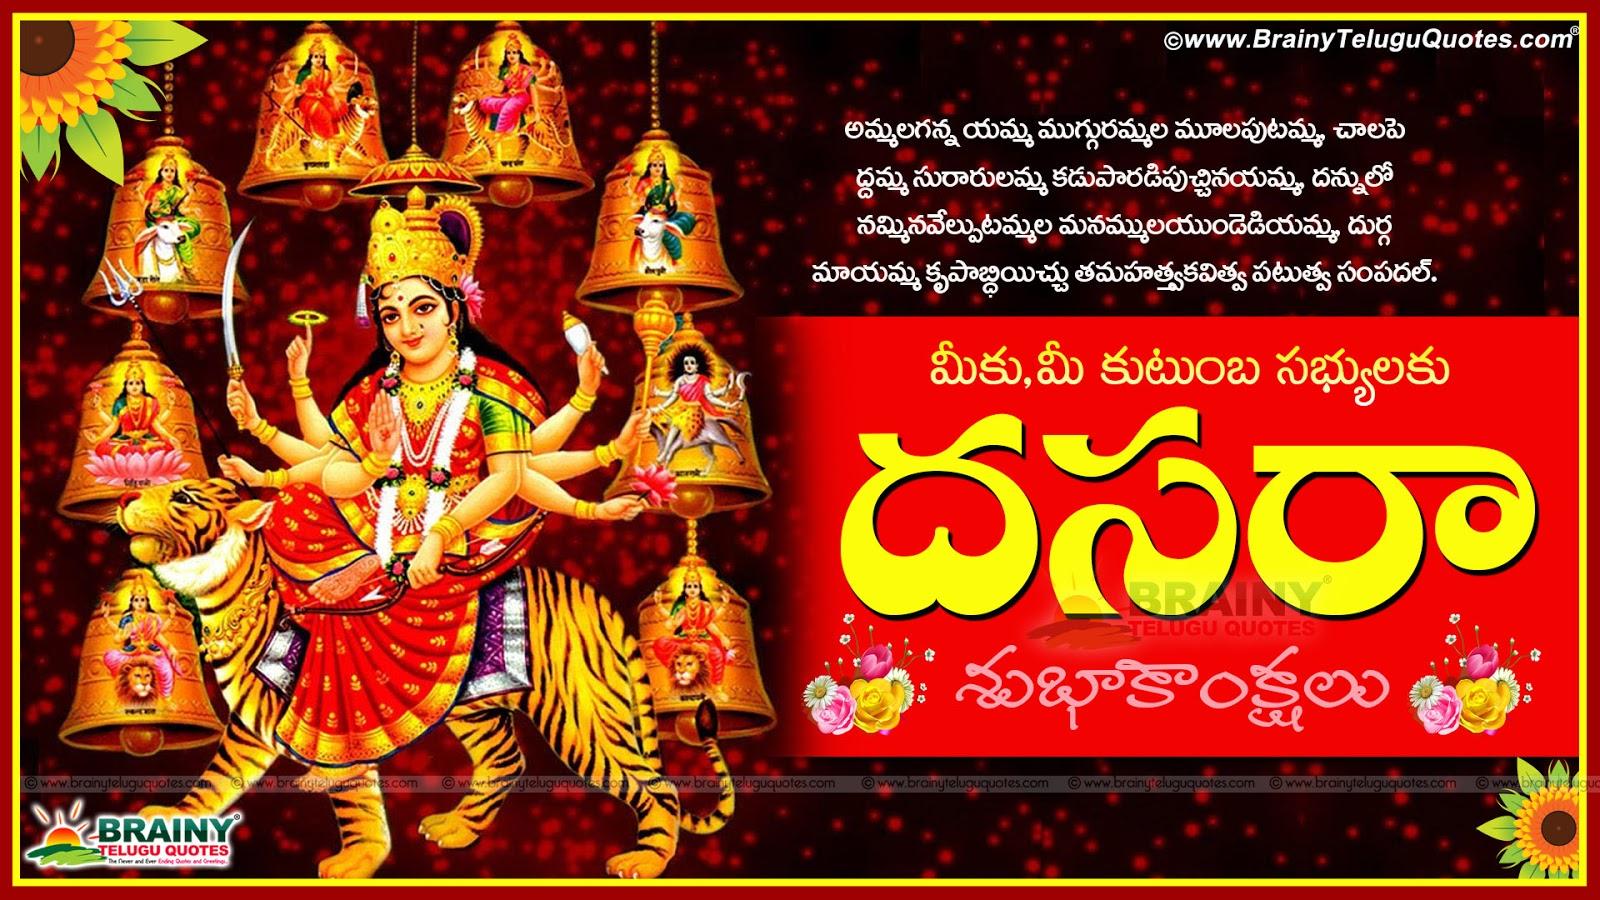 Top vijayadasami wishes wallpapers in telugu language here is a telugu vijayadasami sms images vijayadasami telugu festival prayer vijayadasami telugu songs m4hsunfo